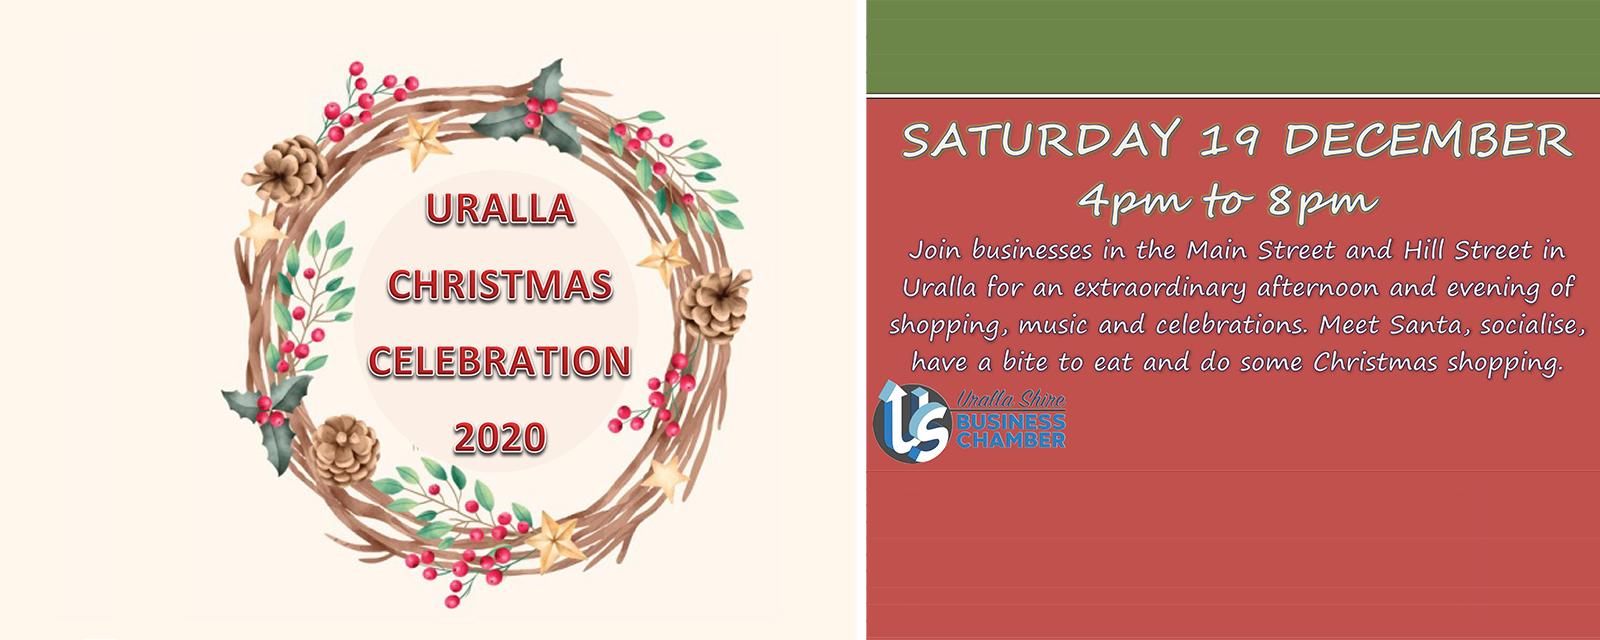 Uralla Christmas Carnival